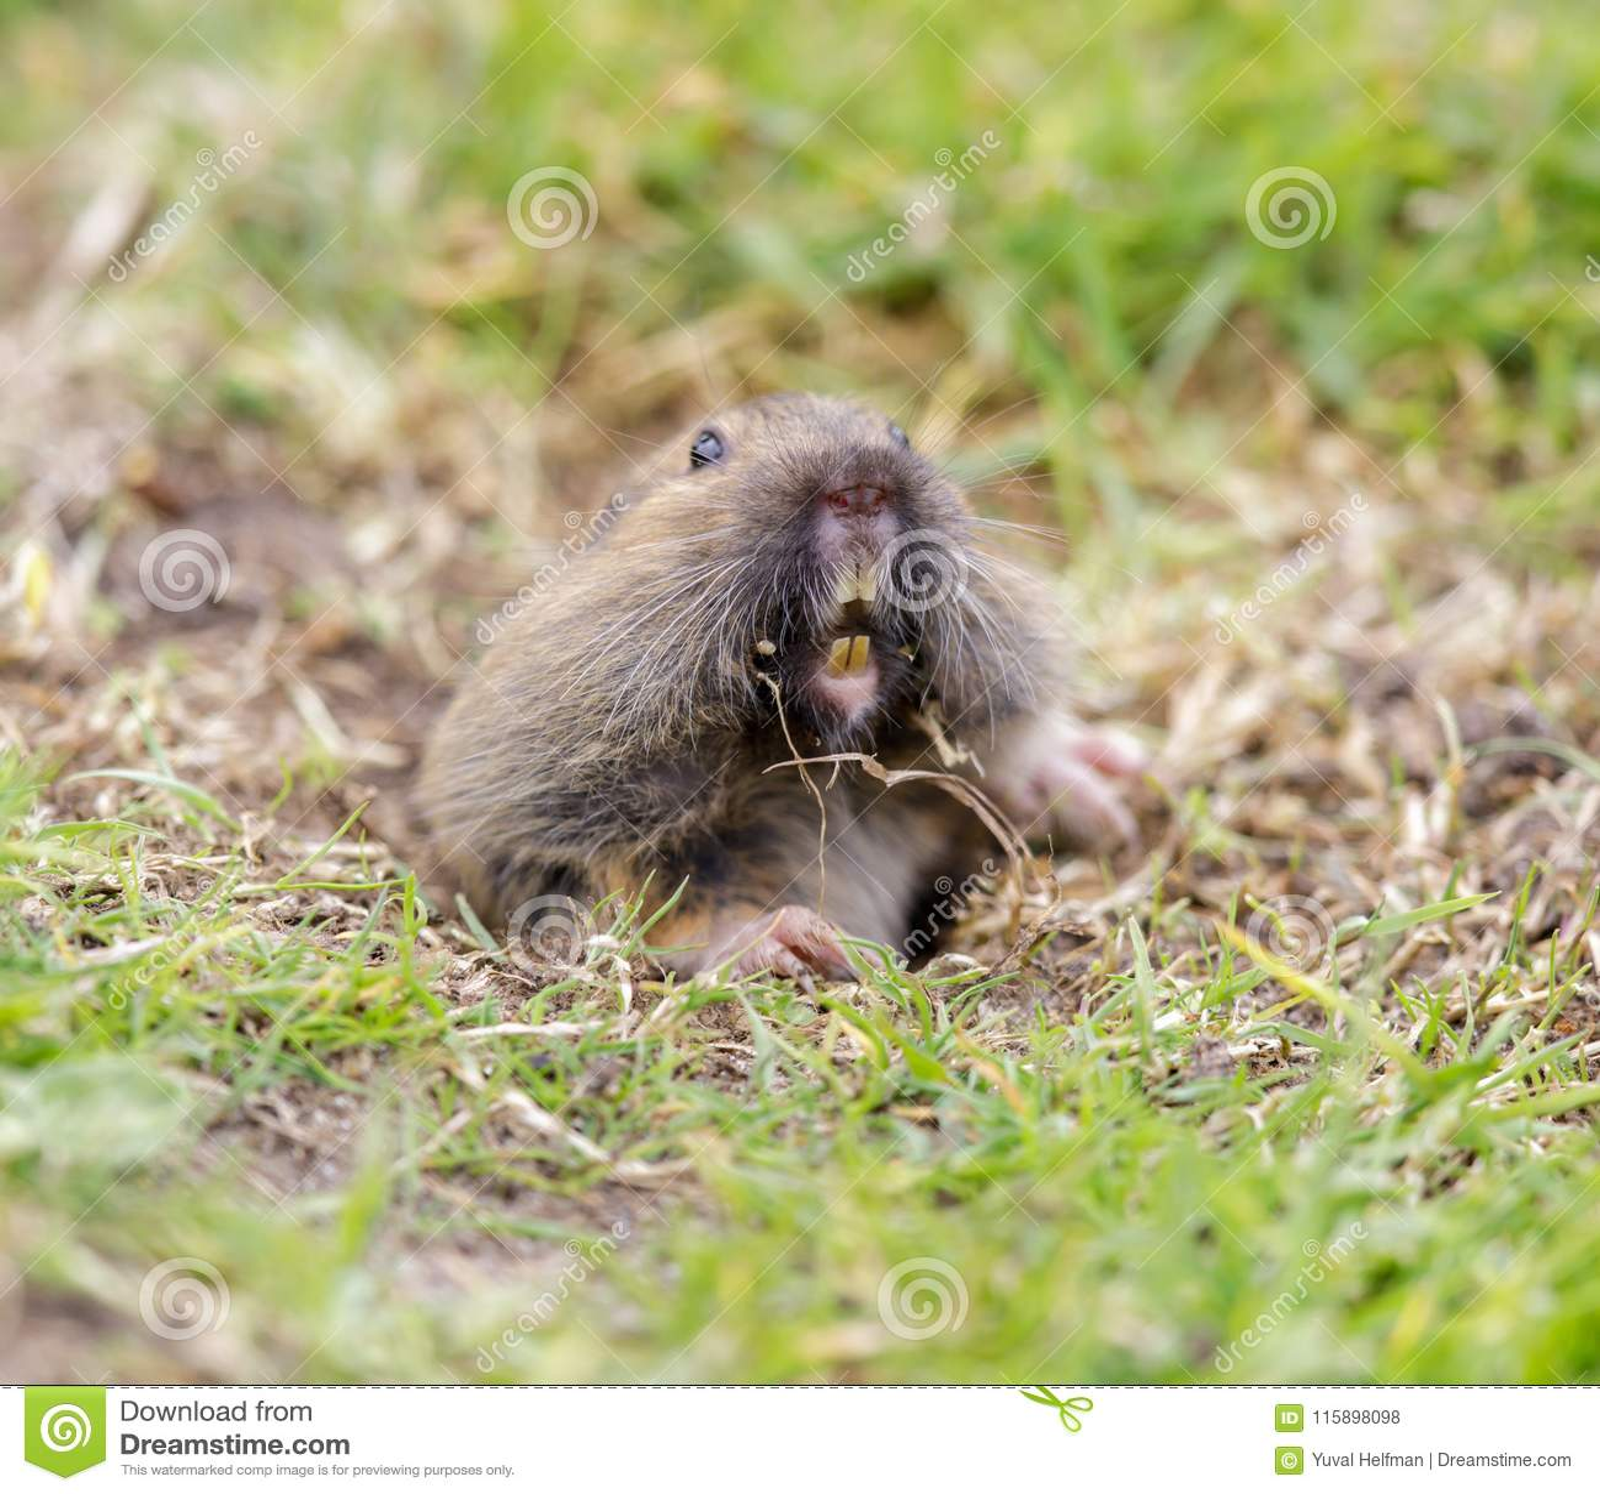 Valley Pocket Gopher Thomomys Bottae Emerging From The Burrow  Stock